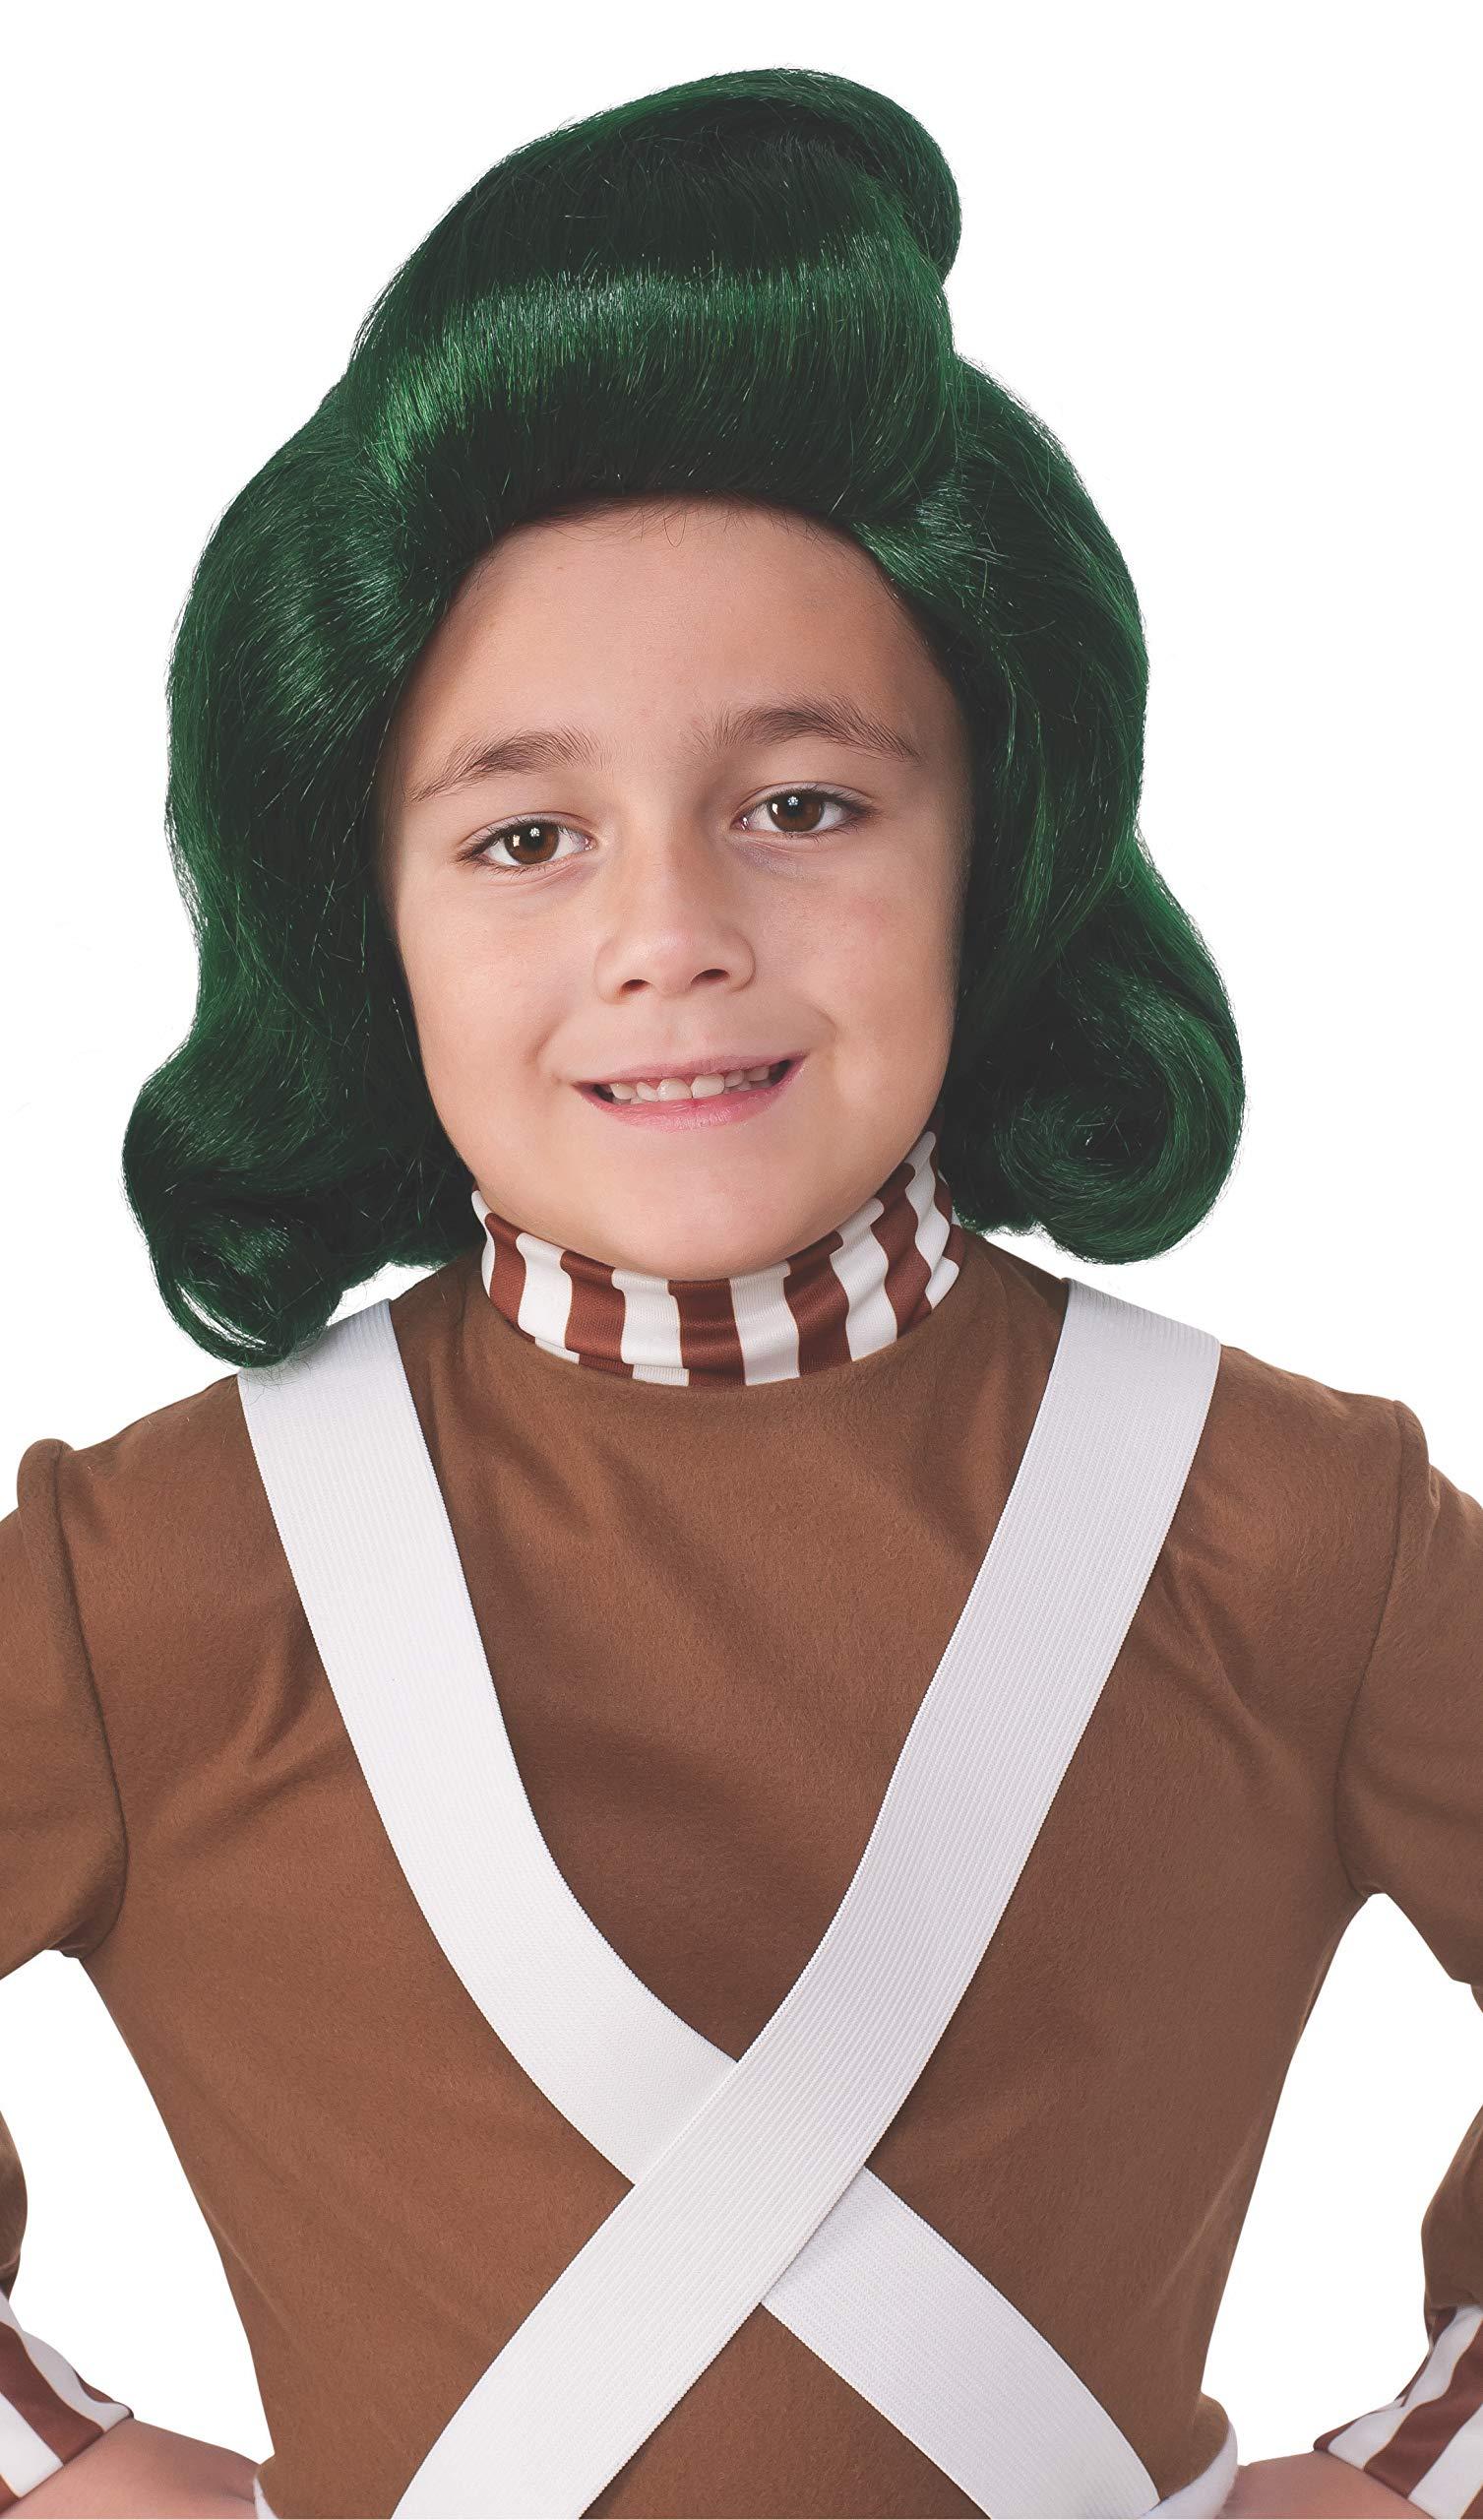 Rubie's Costume Kids Willy Wonka & The Chocolate Factory Oompa Loompa Wig by Rubie's